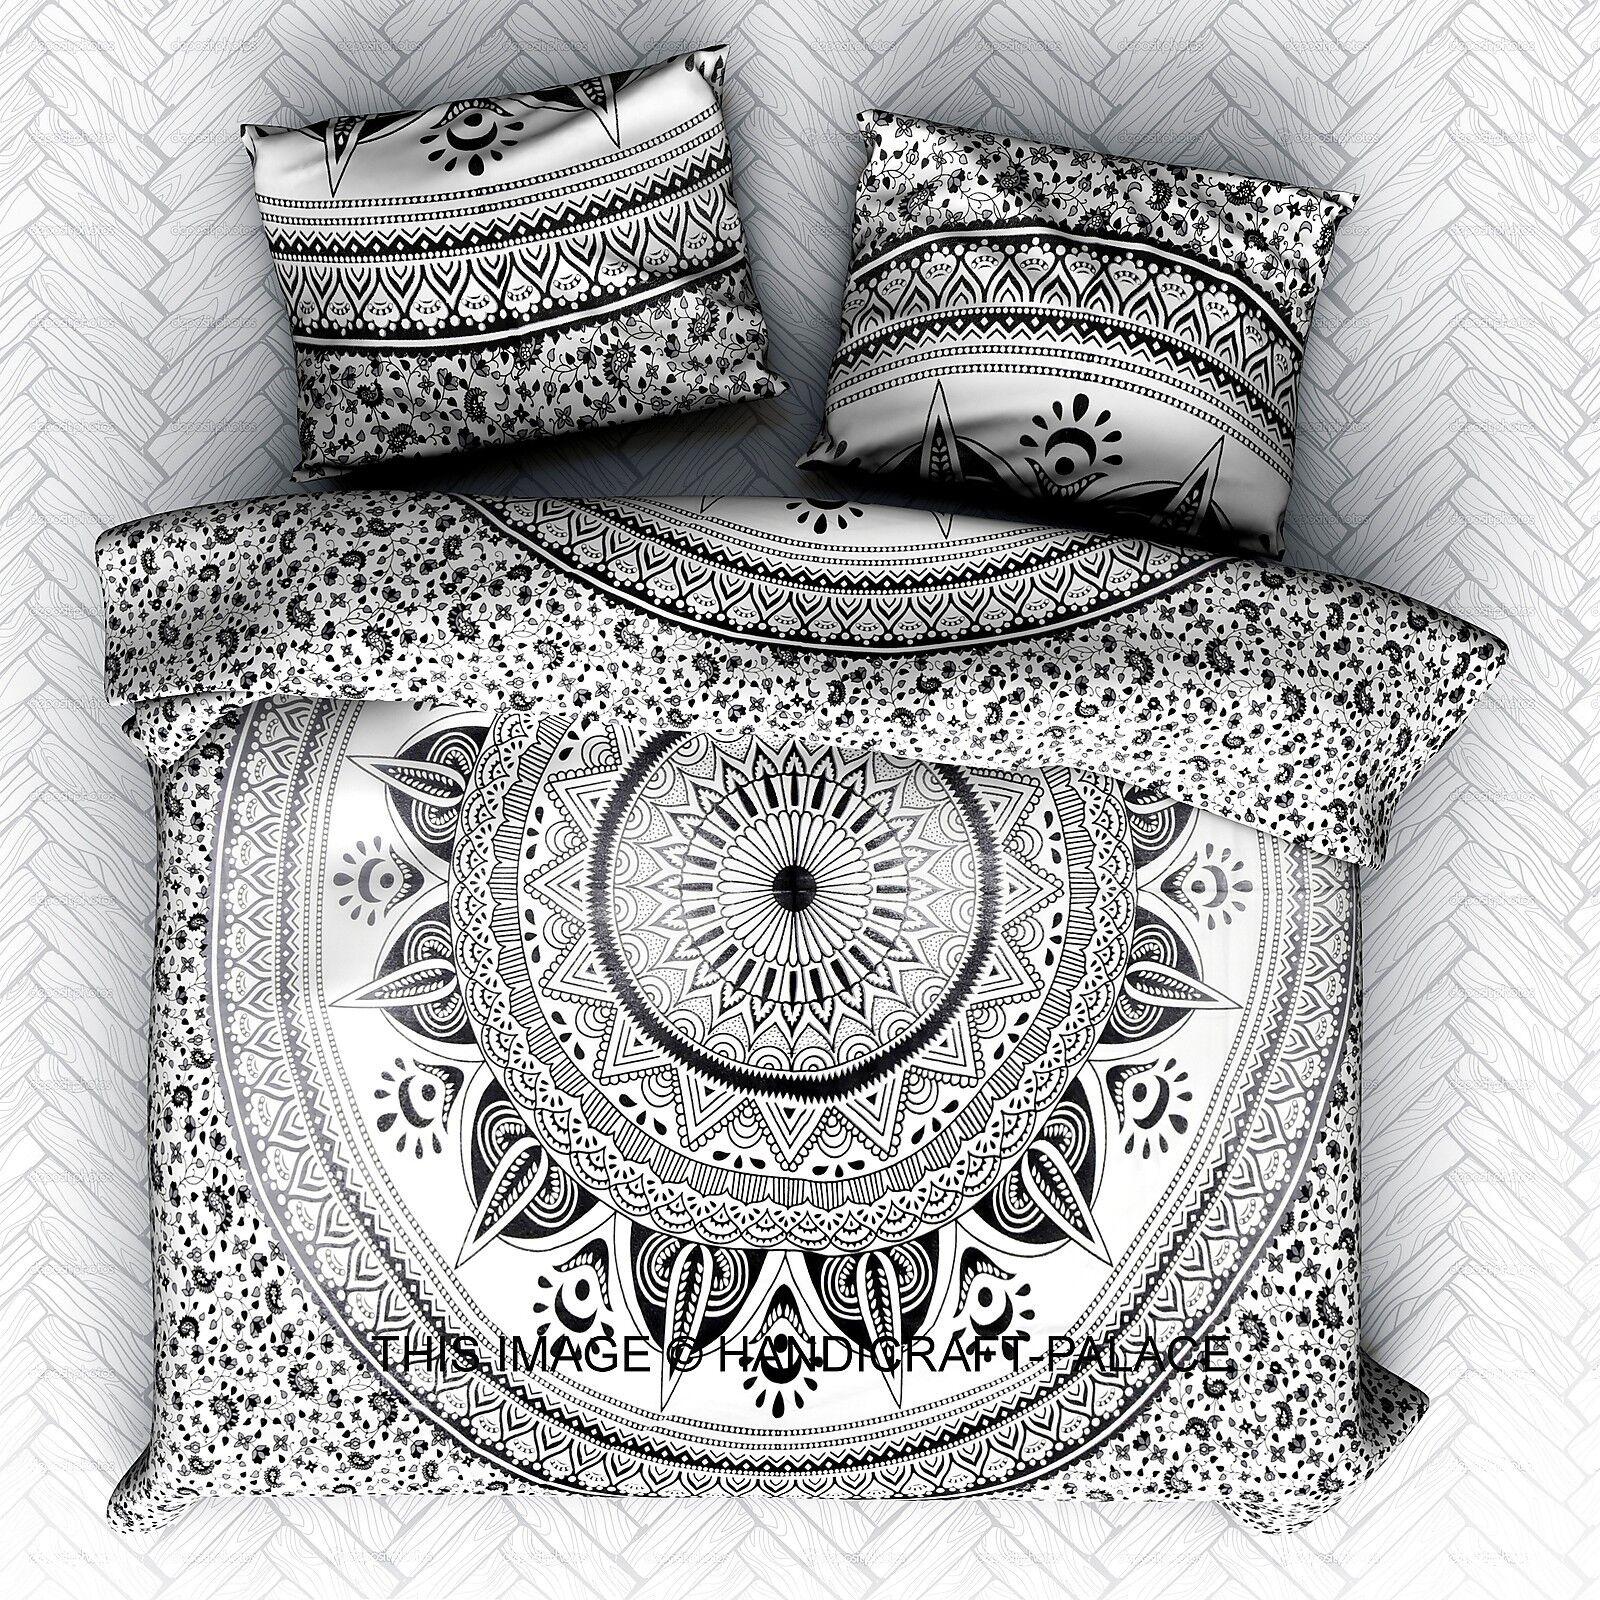 Indian Bed Sheet Bedding Set Hippie Ombre Mandala Tapestry Queen Blanket Throw